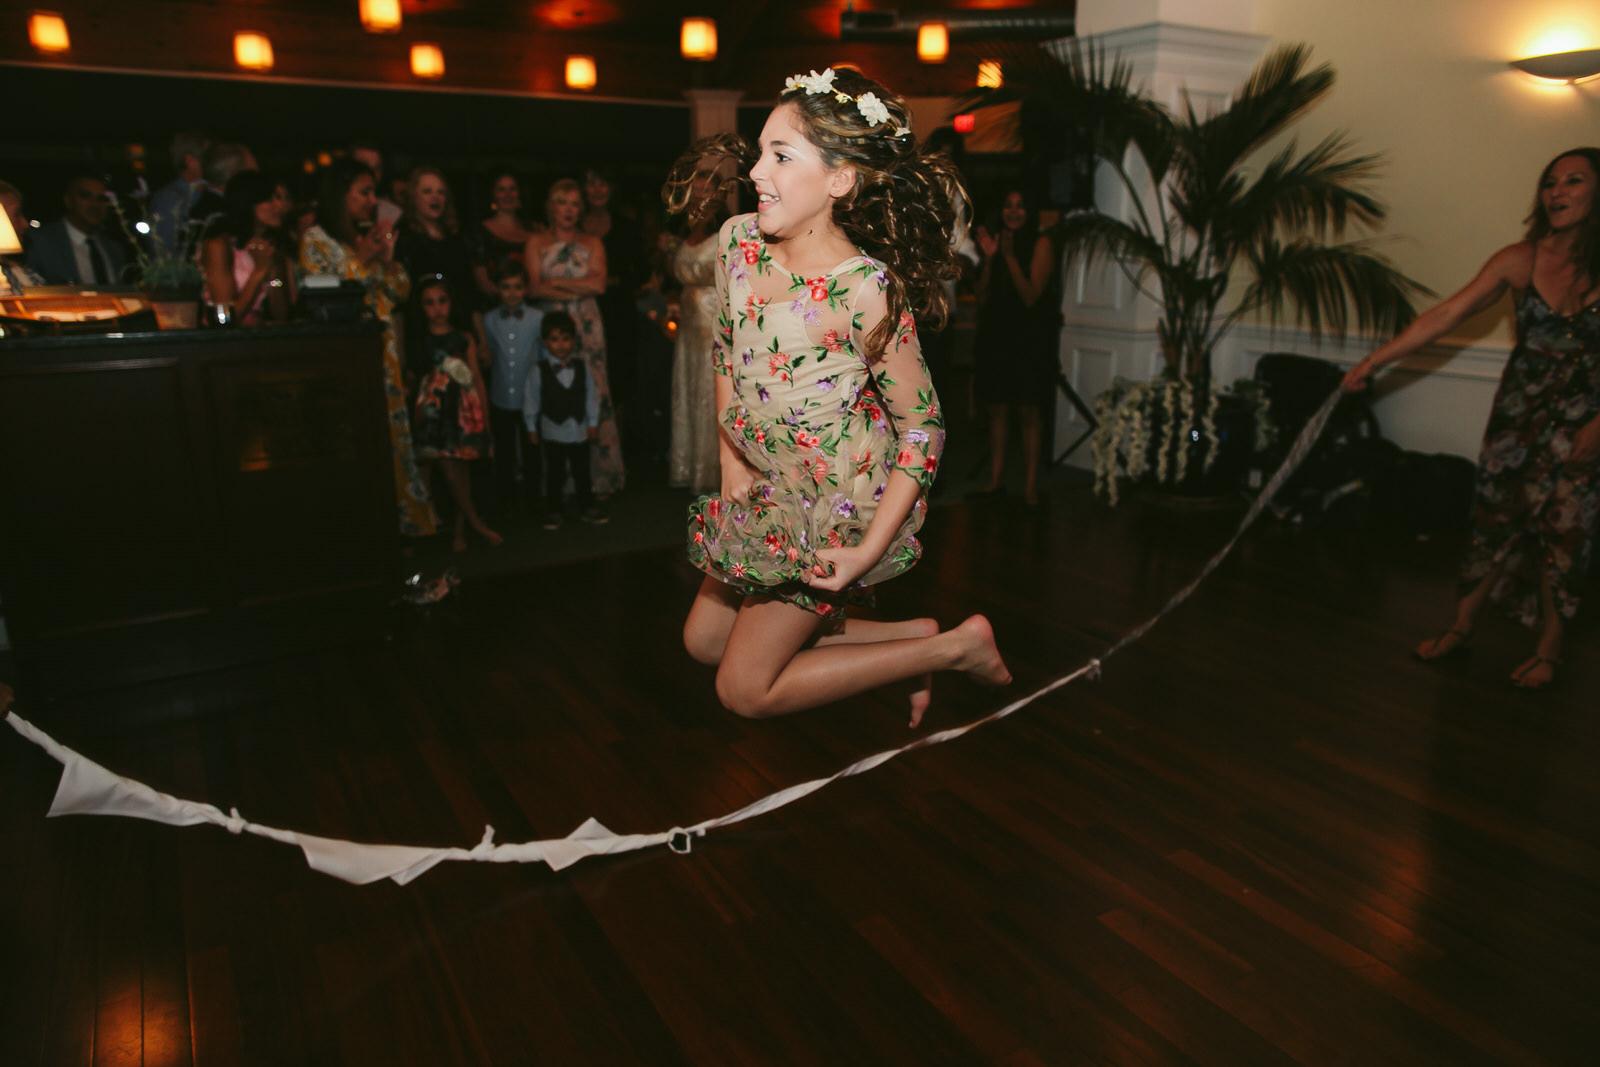 playing-jump-rope-wedding-reception-jensen-beach-wedding-photographer-tiny-house-photo